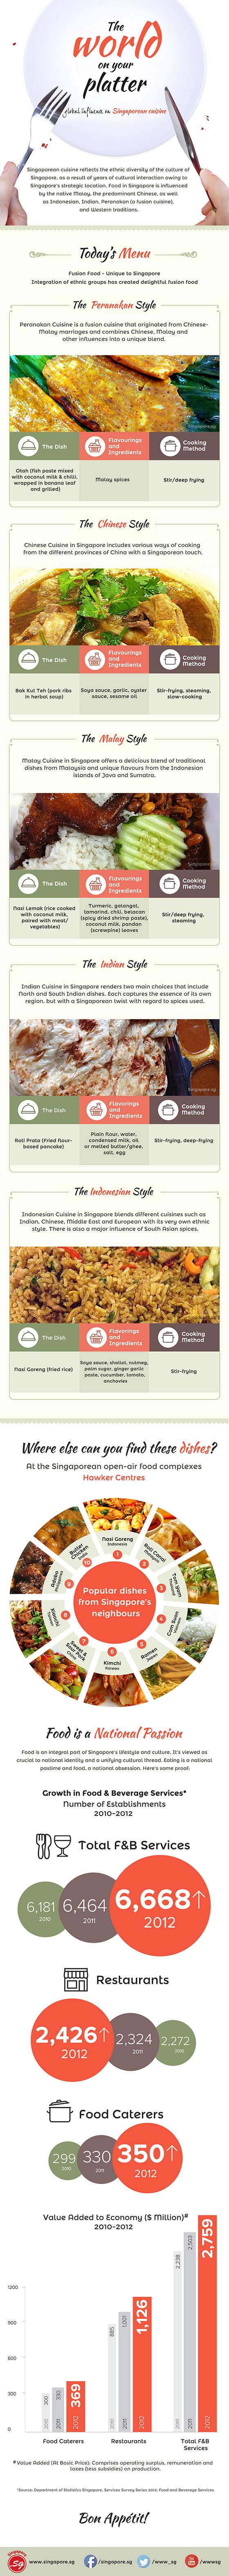 Singaporeon Cuisine: The World On Your Platter